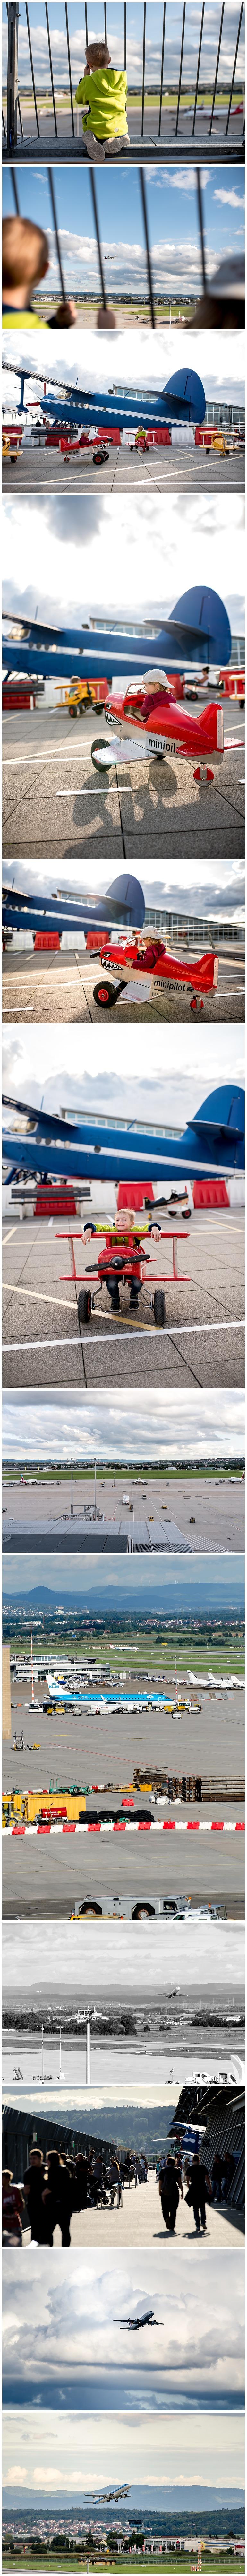 Ausflugtipp: Stuttgarter Flughafen